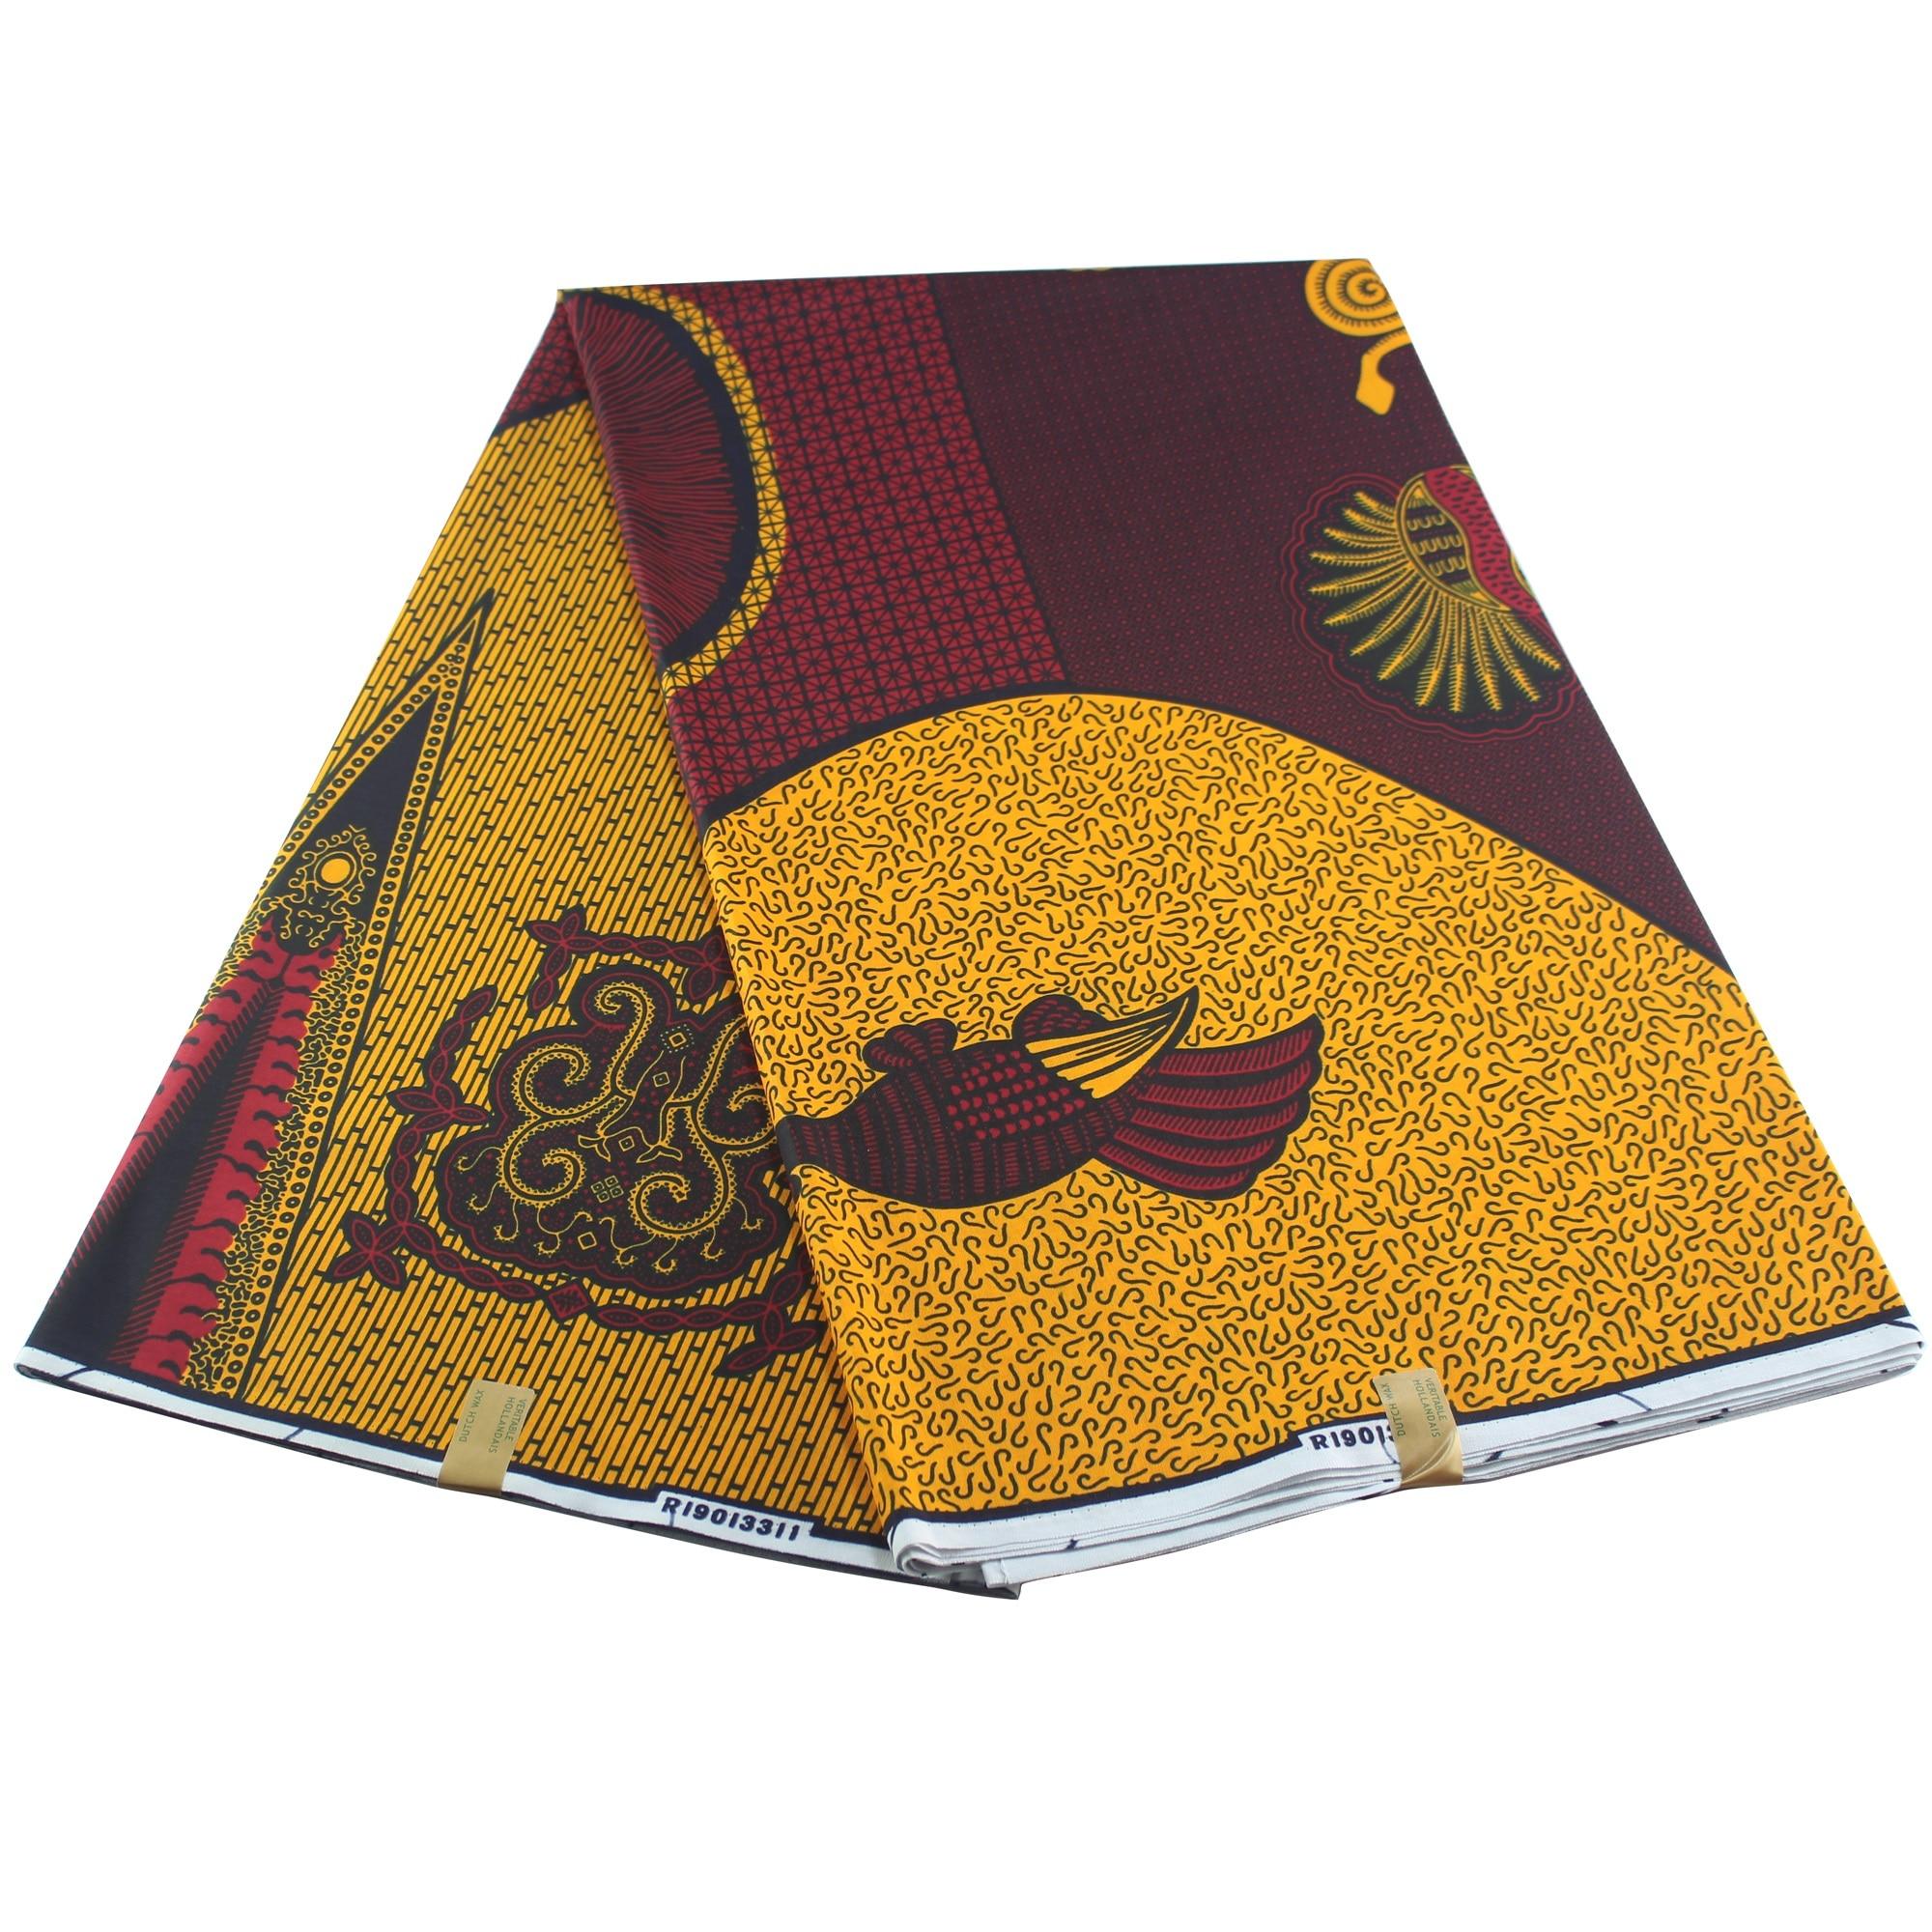 Veritable Wax Super Hollandais Guaranteed Real Dutch Wax High Quality Pagne Hot Hollandais 6yard African Ankara Sewing Fabric